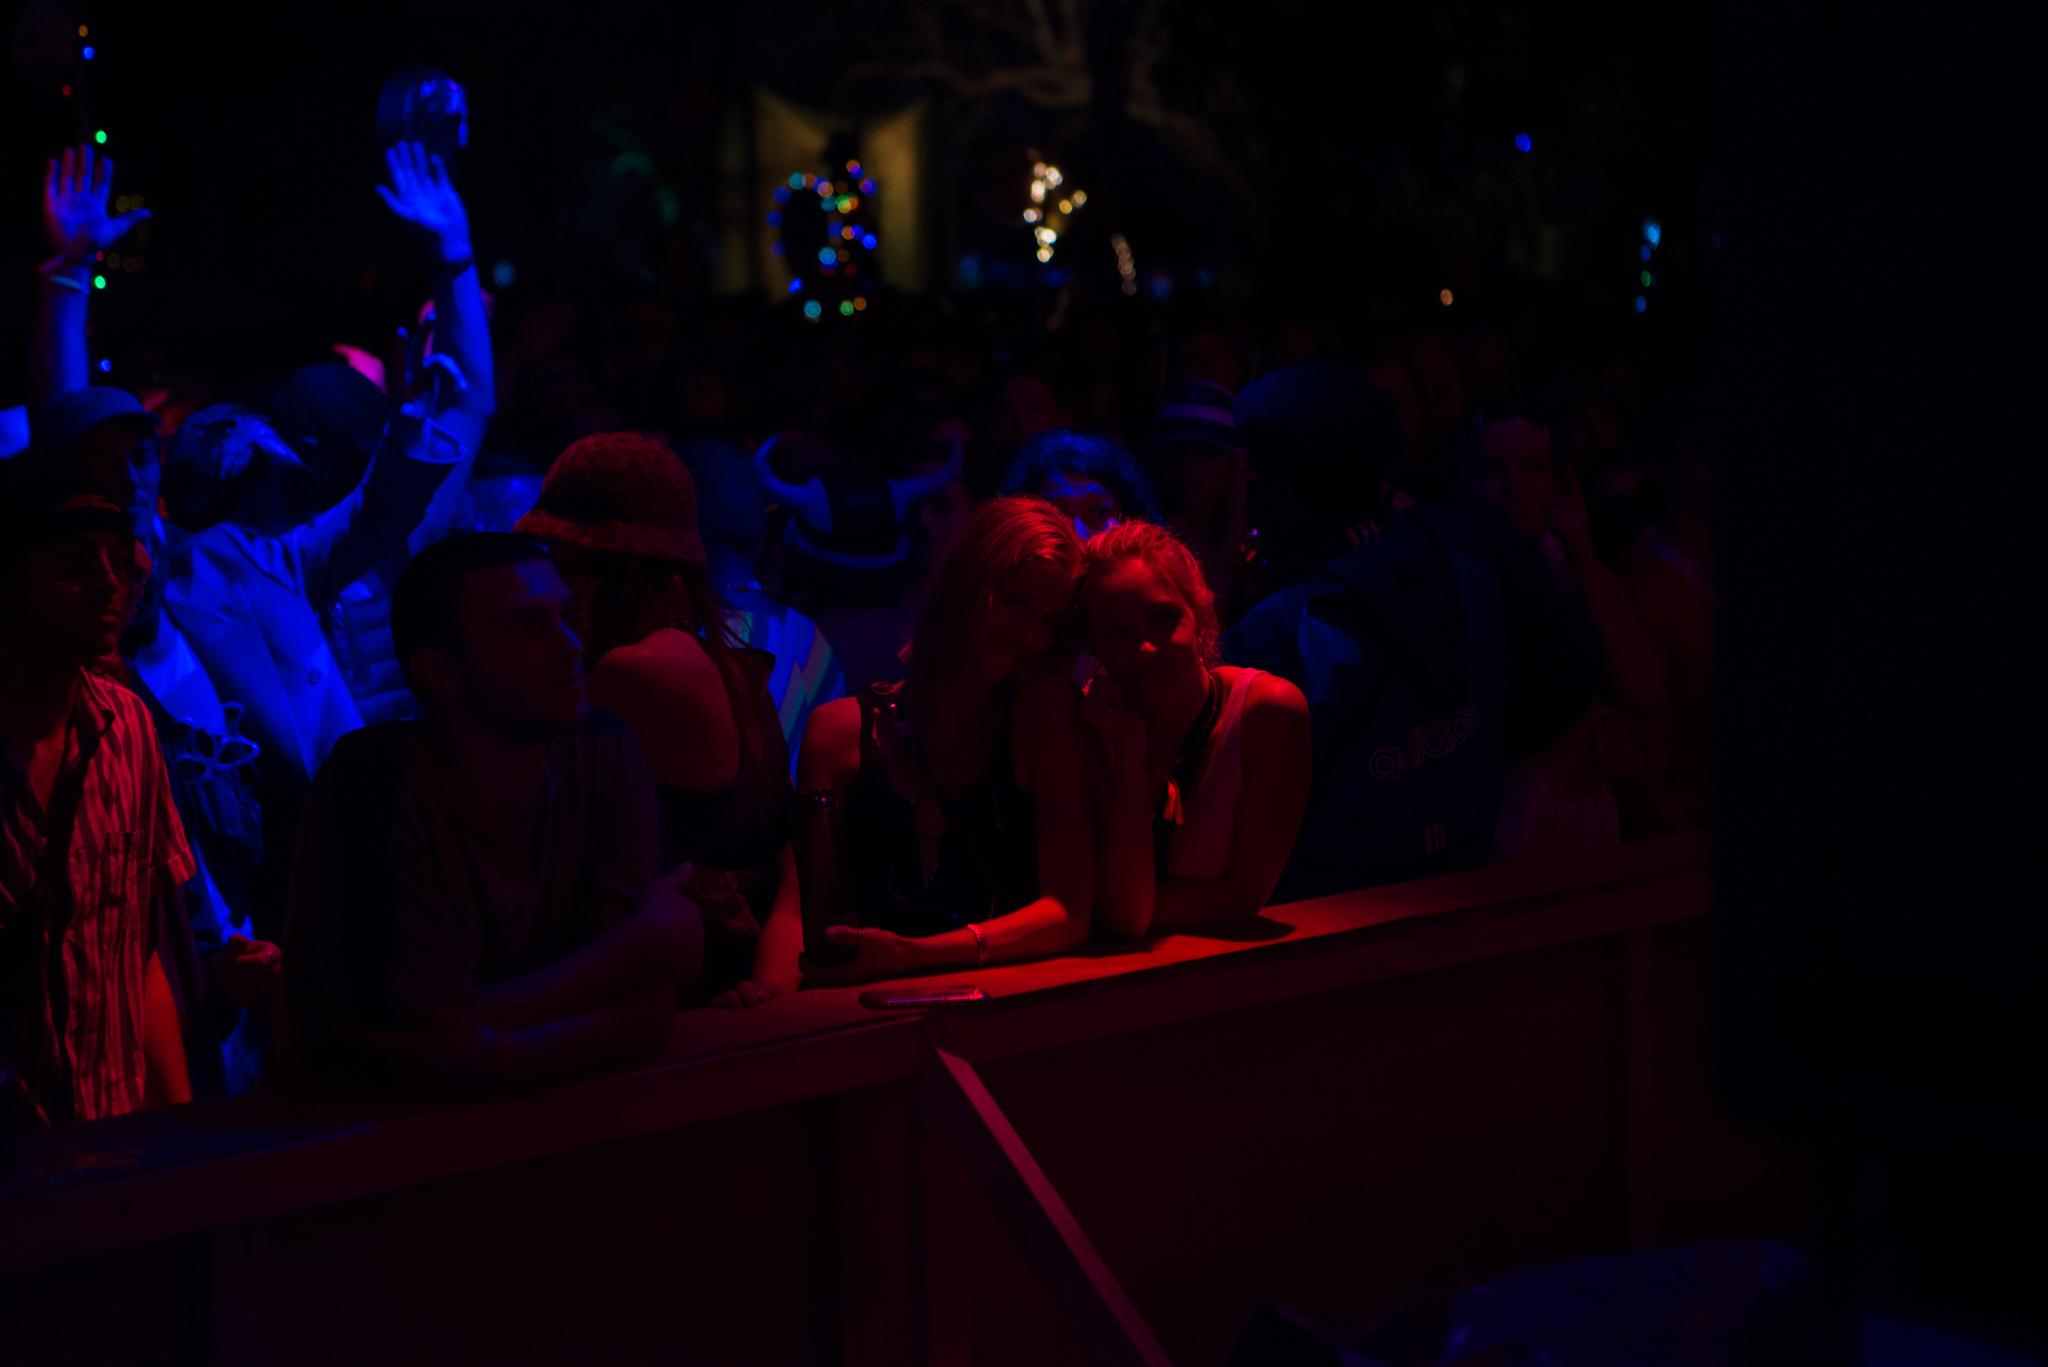 CALTRISTAN_CAL-TRISTAN_PITCH_FESTIVAL_PHOTOGRAPHY_PHOTOGRAPHER-77.jpg